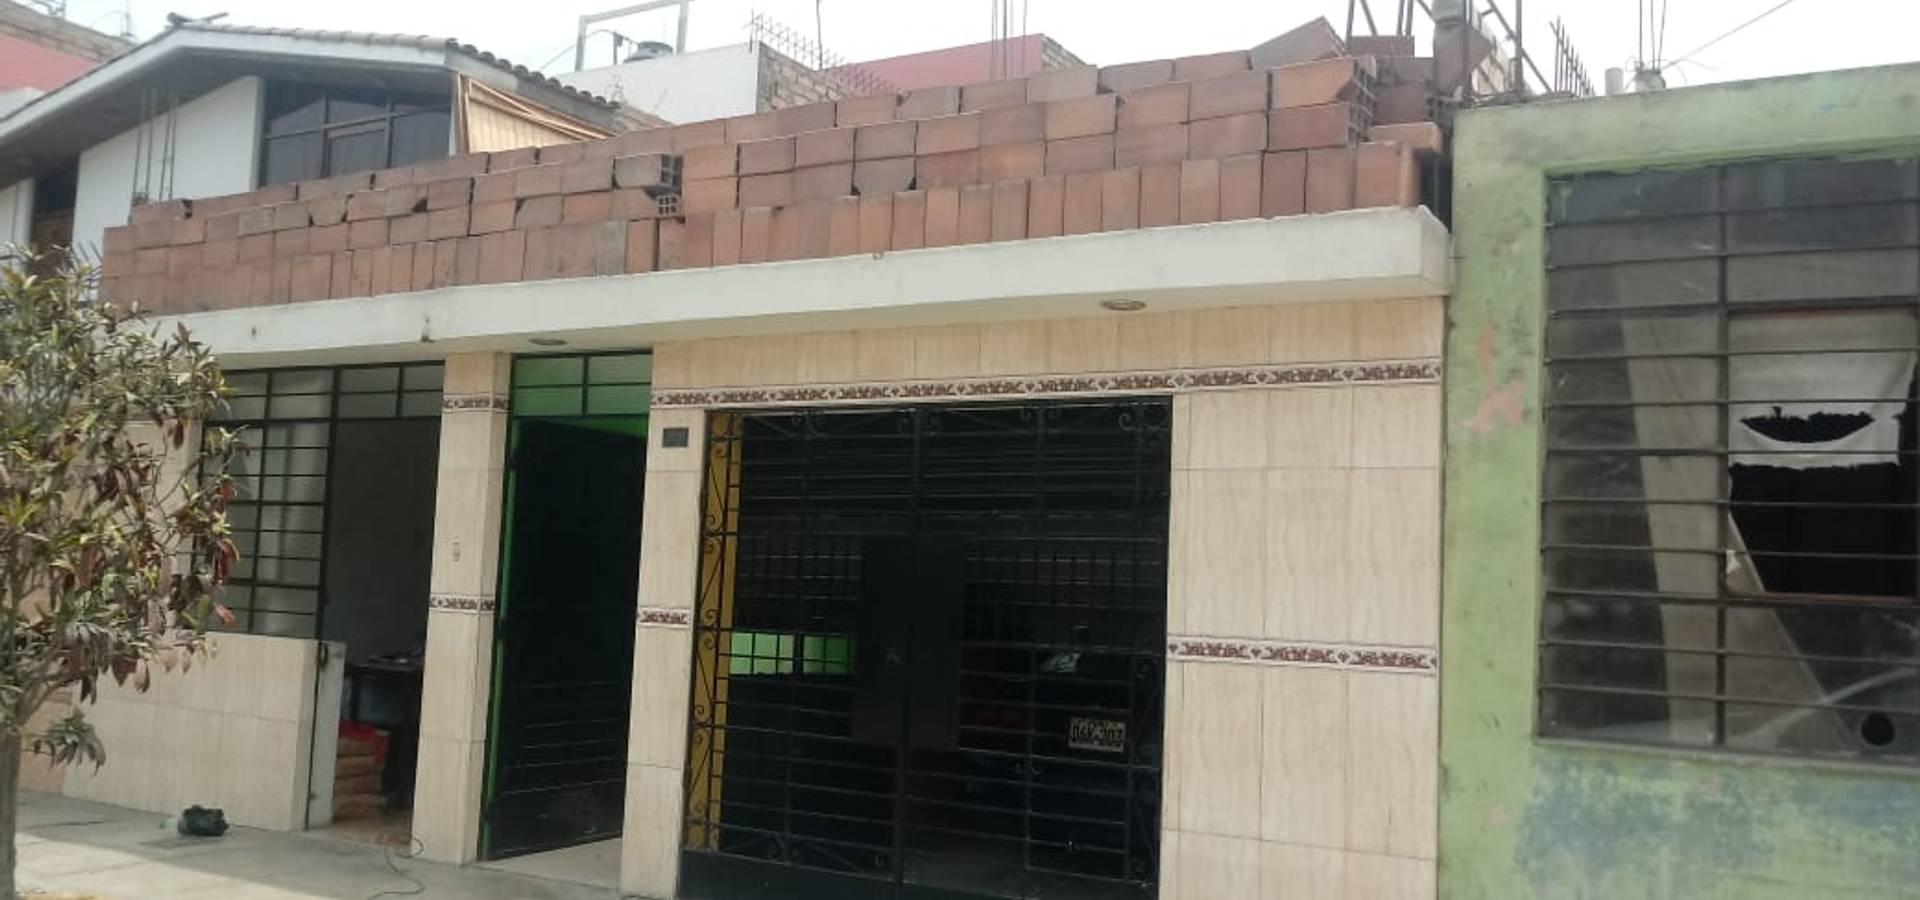 HOUSE PERU SAC